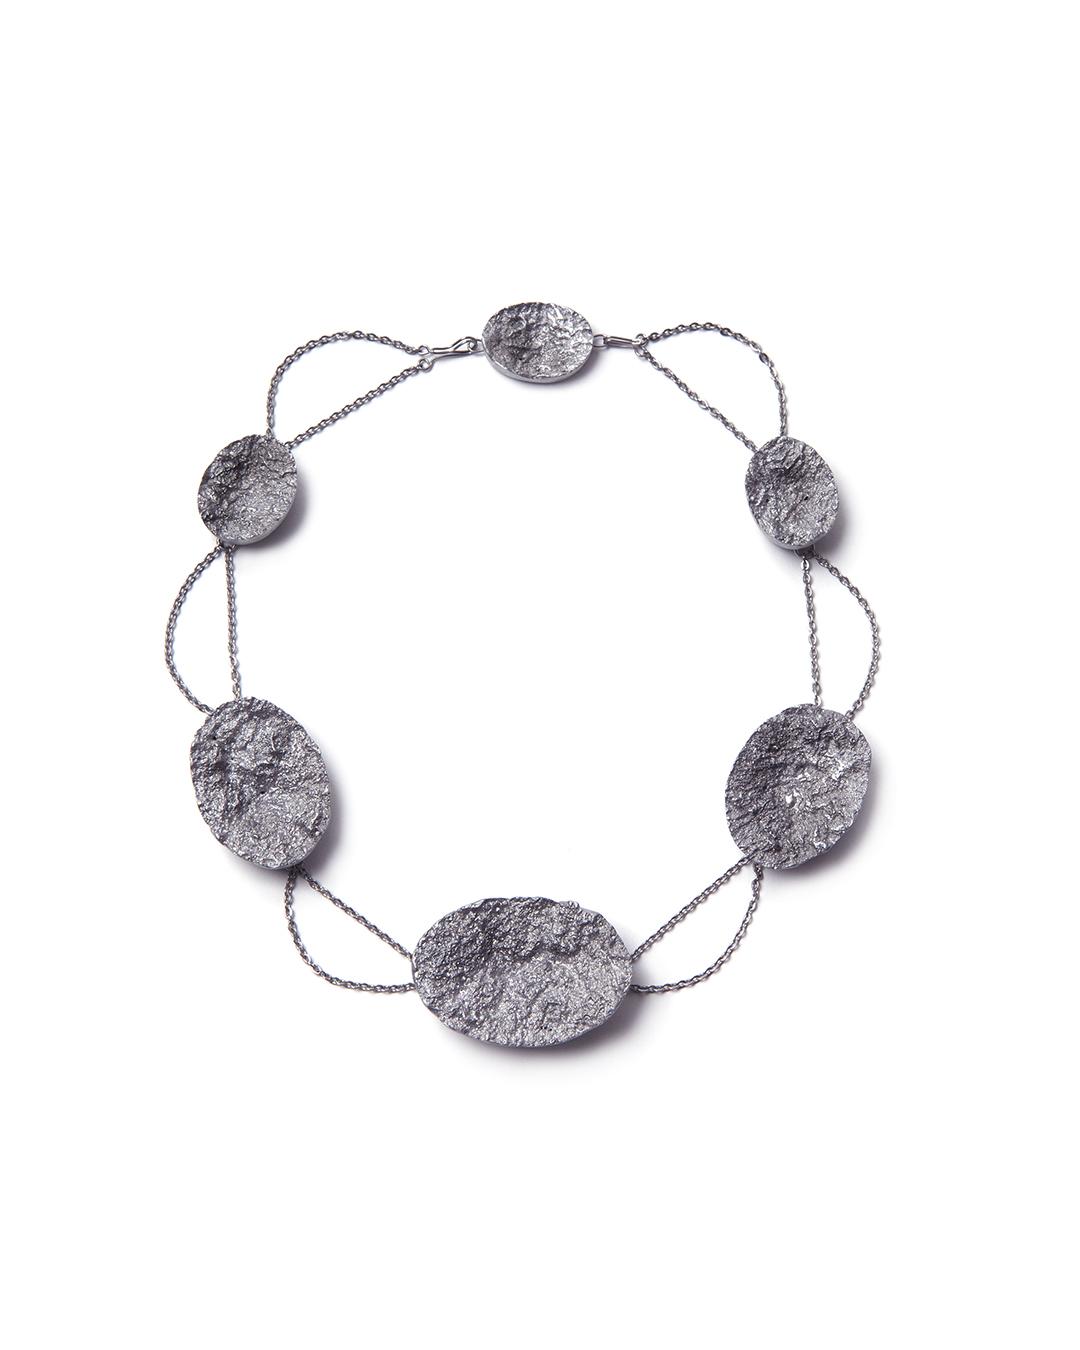 Barbara Schrobenhauser, Surfaces, 2015, necklace; aluminium, stainless steel, silver, 490 x 12 mm, €1575